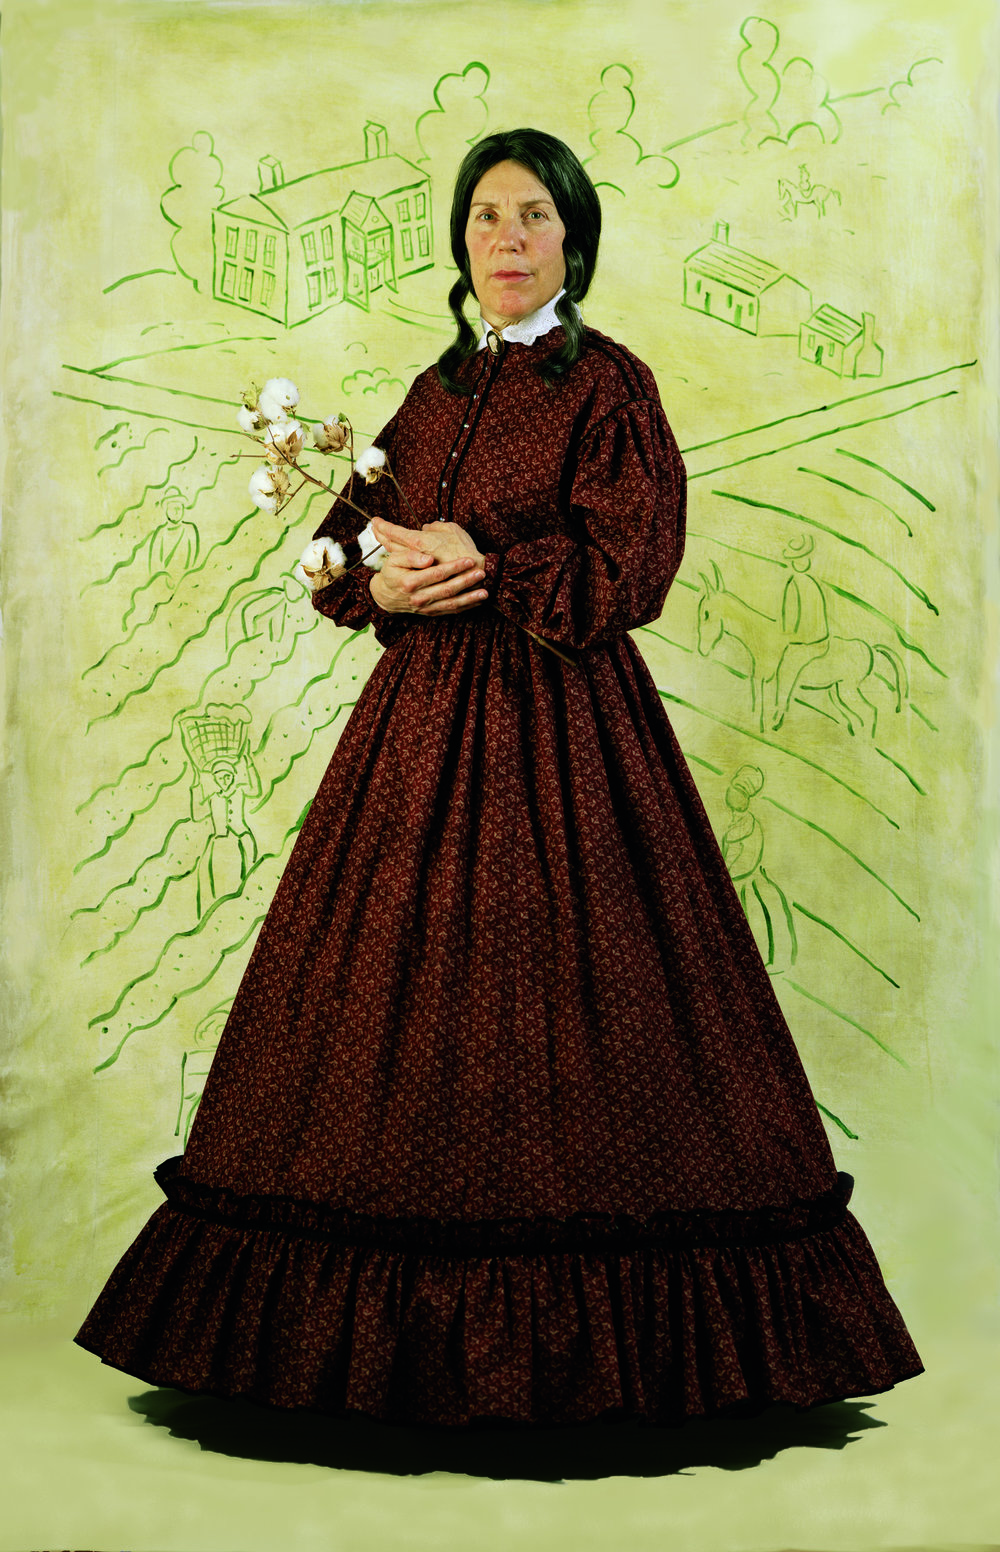 Eugenia Mary Felder Buchanan